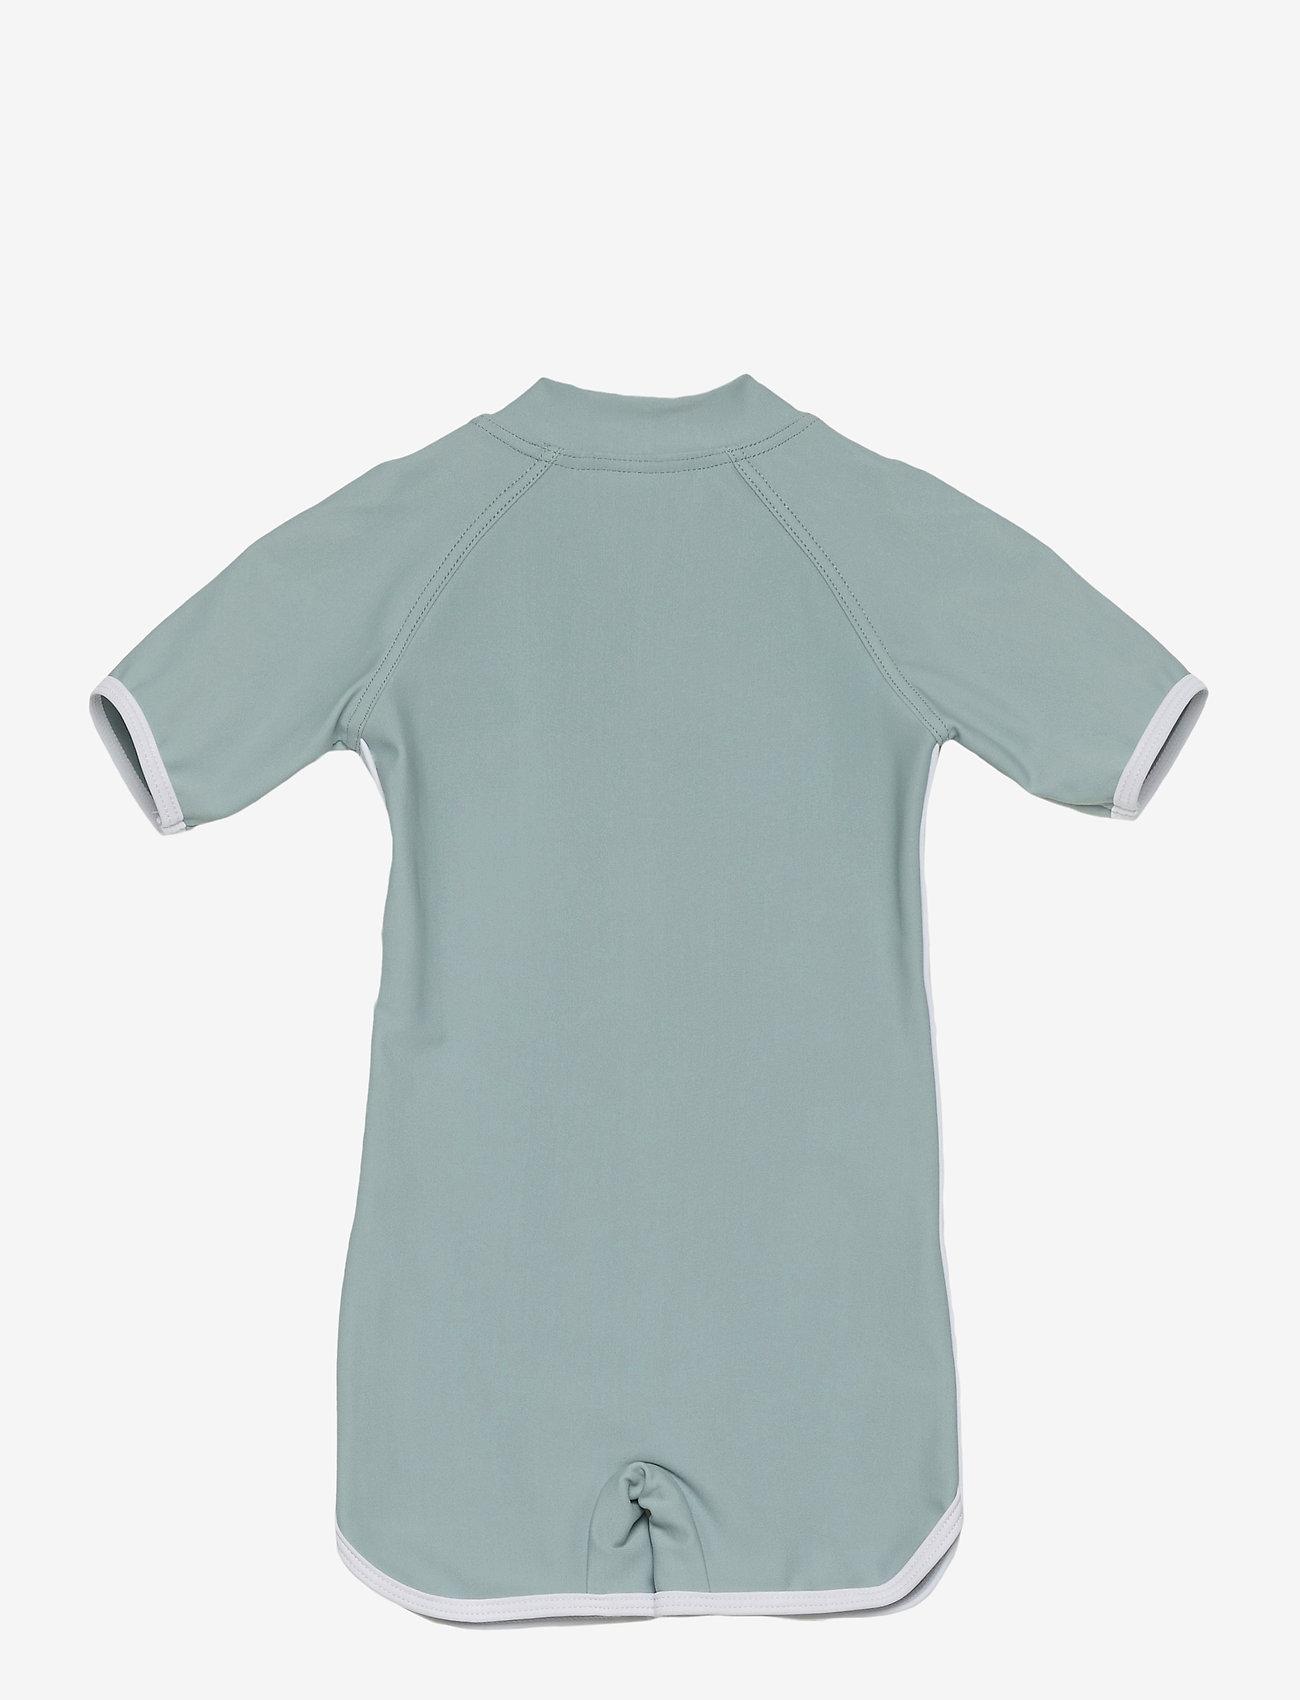 Liewood - Triton swim jumpsuit - swimsuits - sea blue - 1